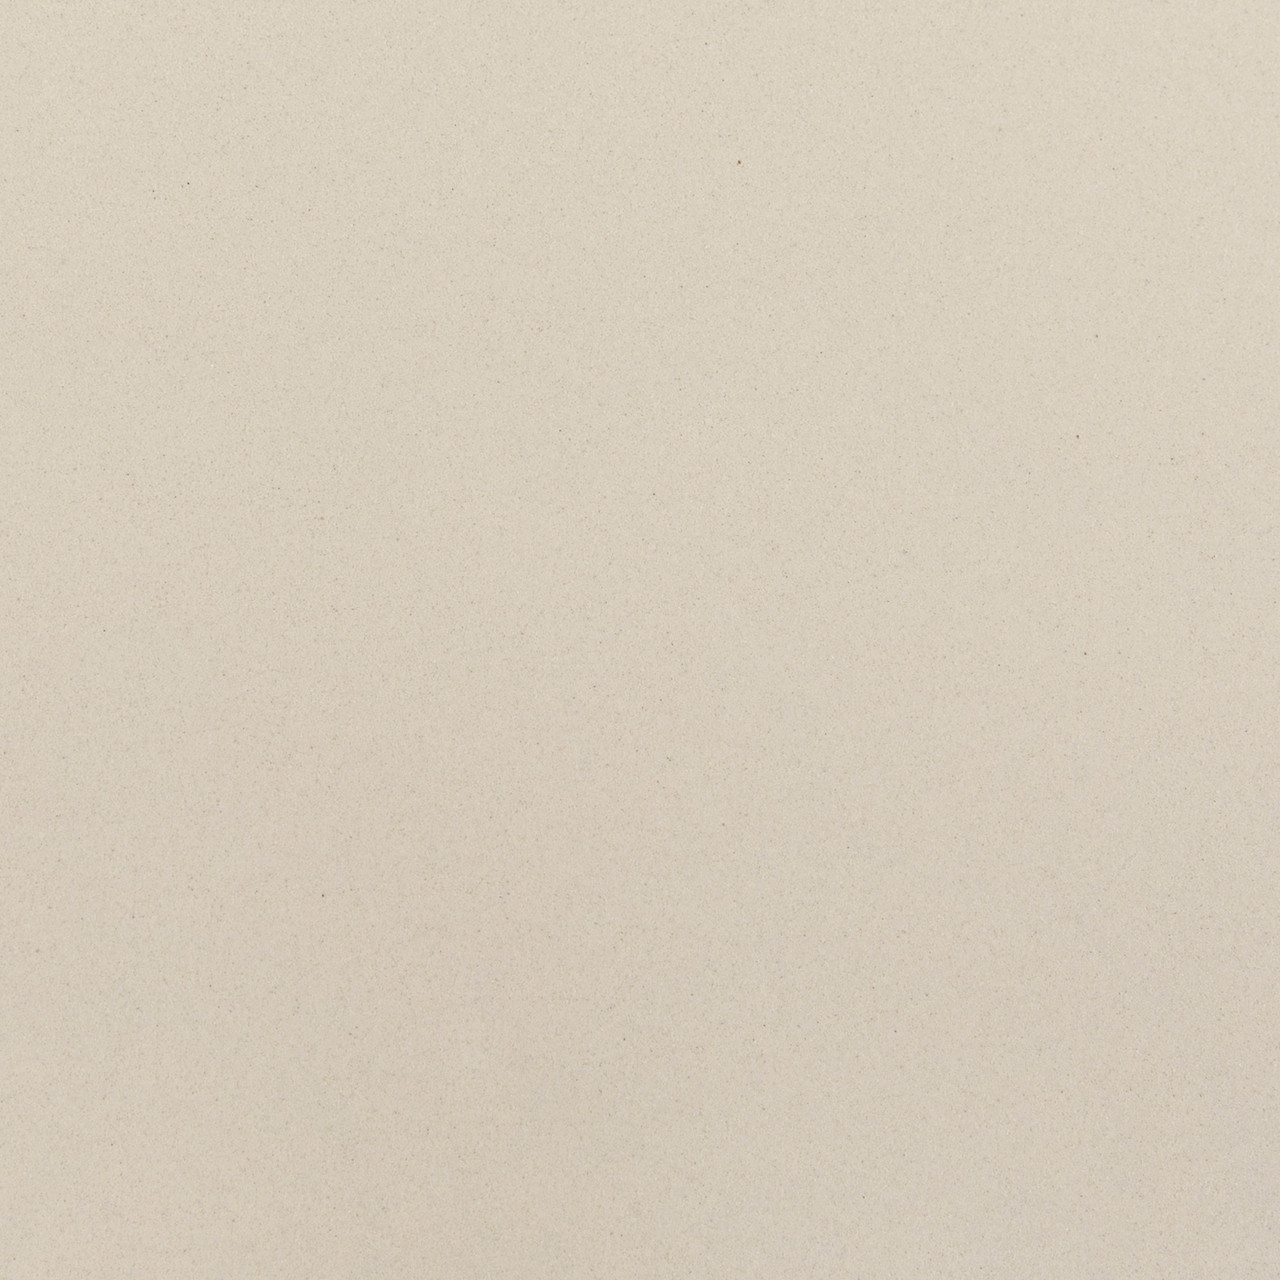 Плитка для пола ГРЕС 12 мм MN 000 200x200 /96